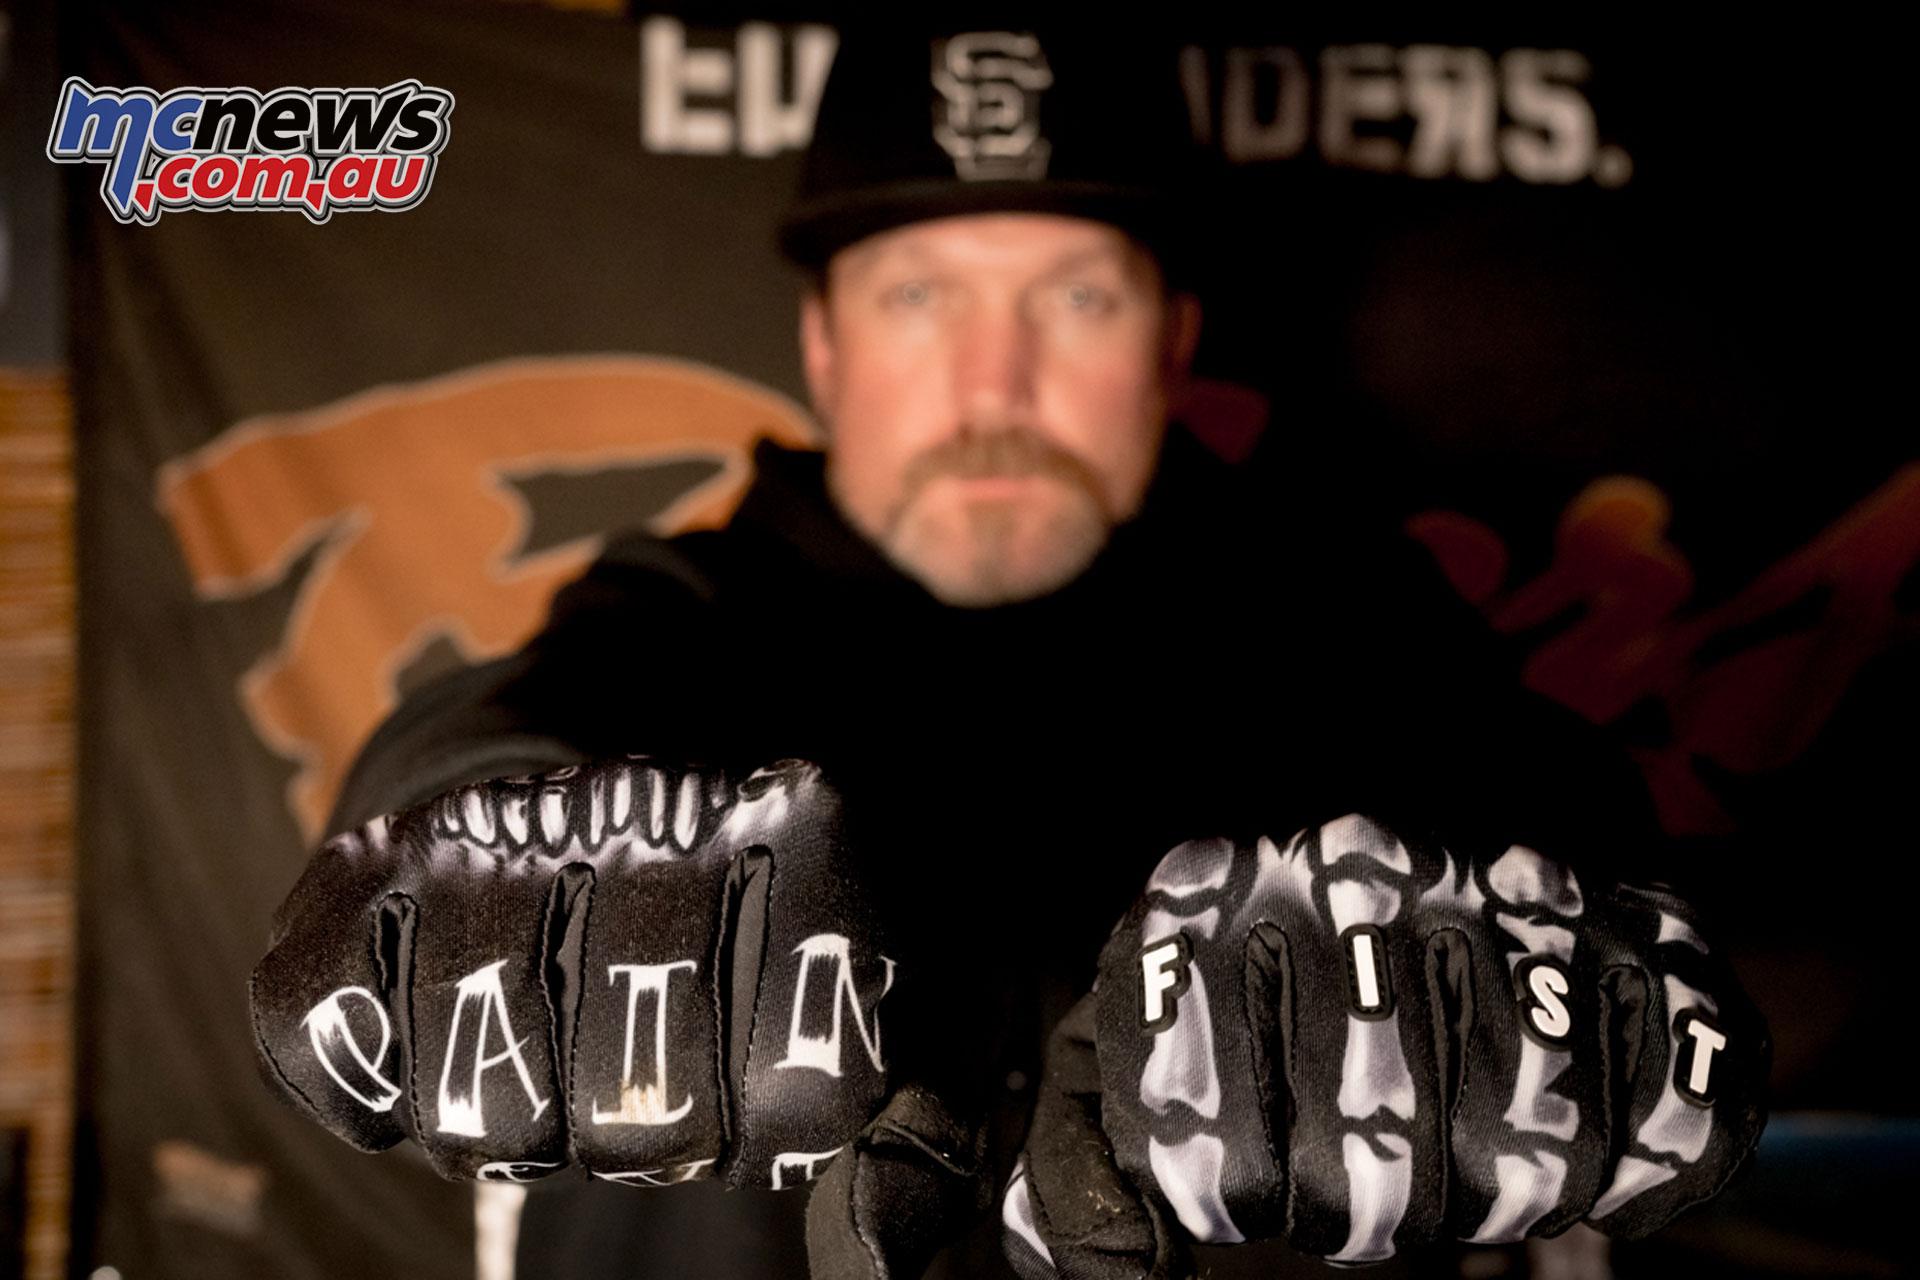 Ficeda introduce the FIST Seth Enslow glove | MCNews com au